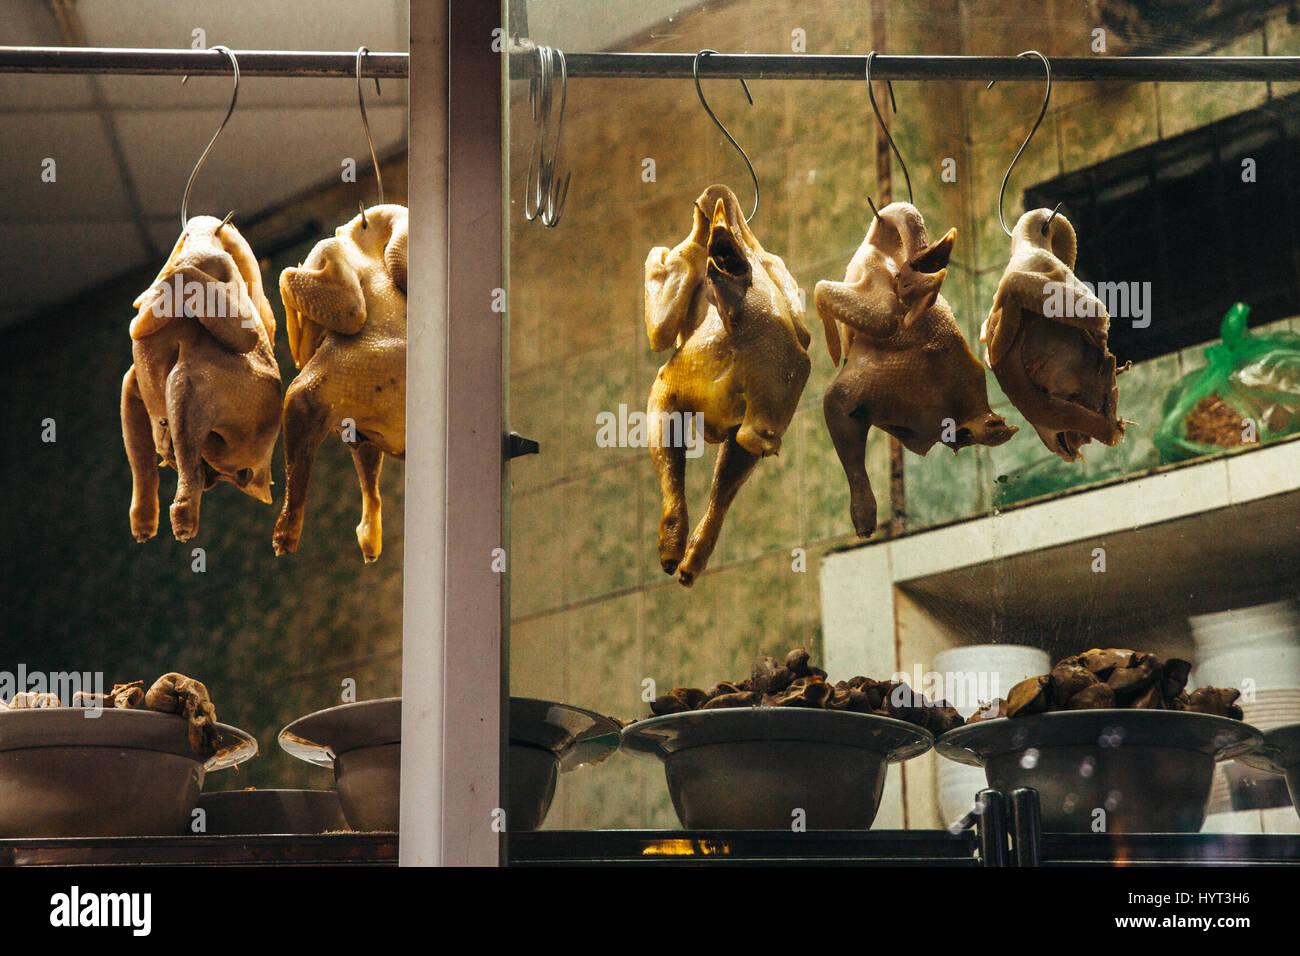 Dead Chickens Hanging at Pho Restaurant in Saigon, Ho Chi Minh City, Vietnam - Stock Image